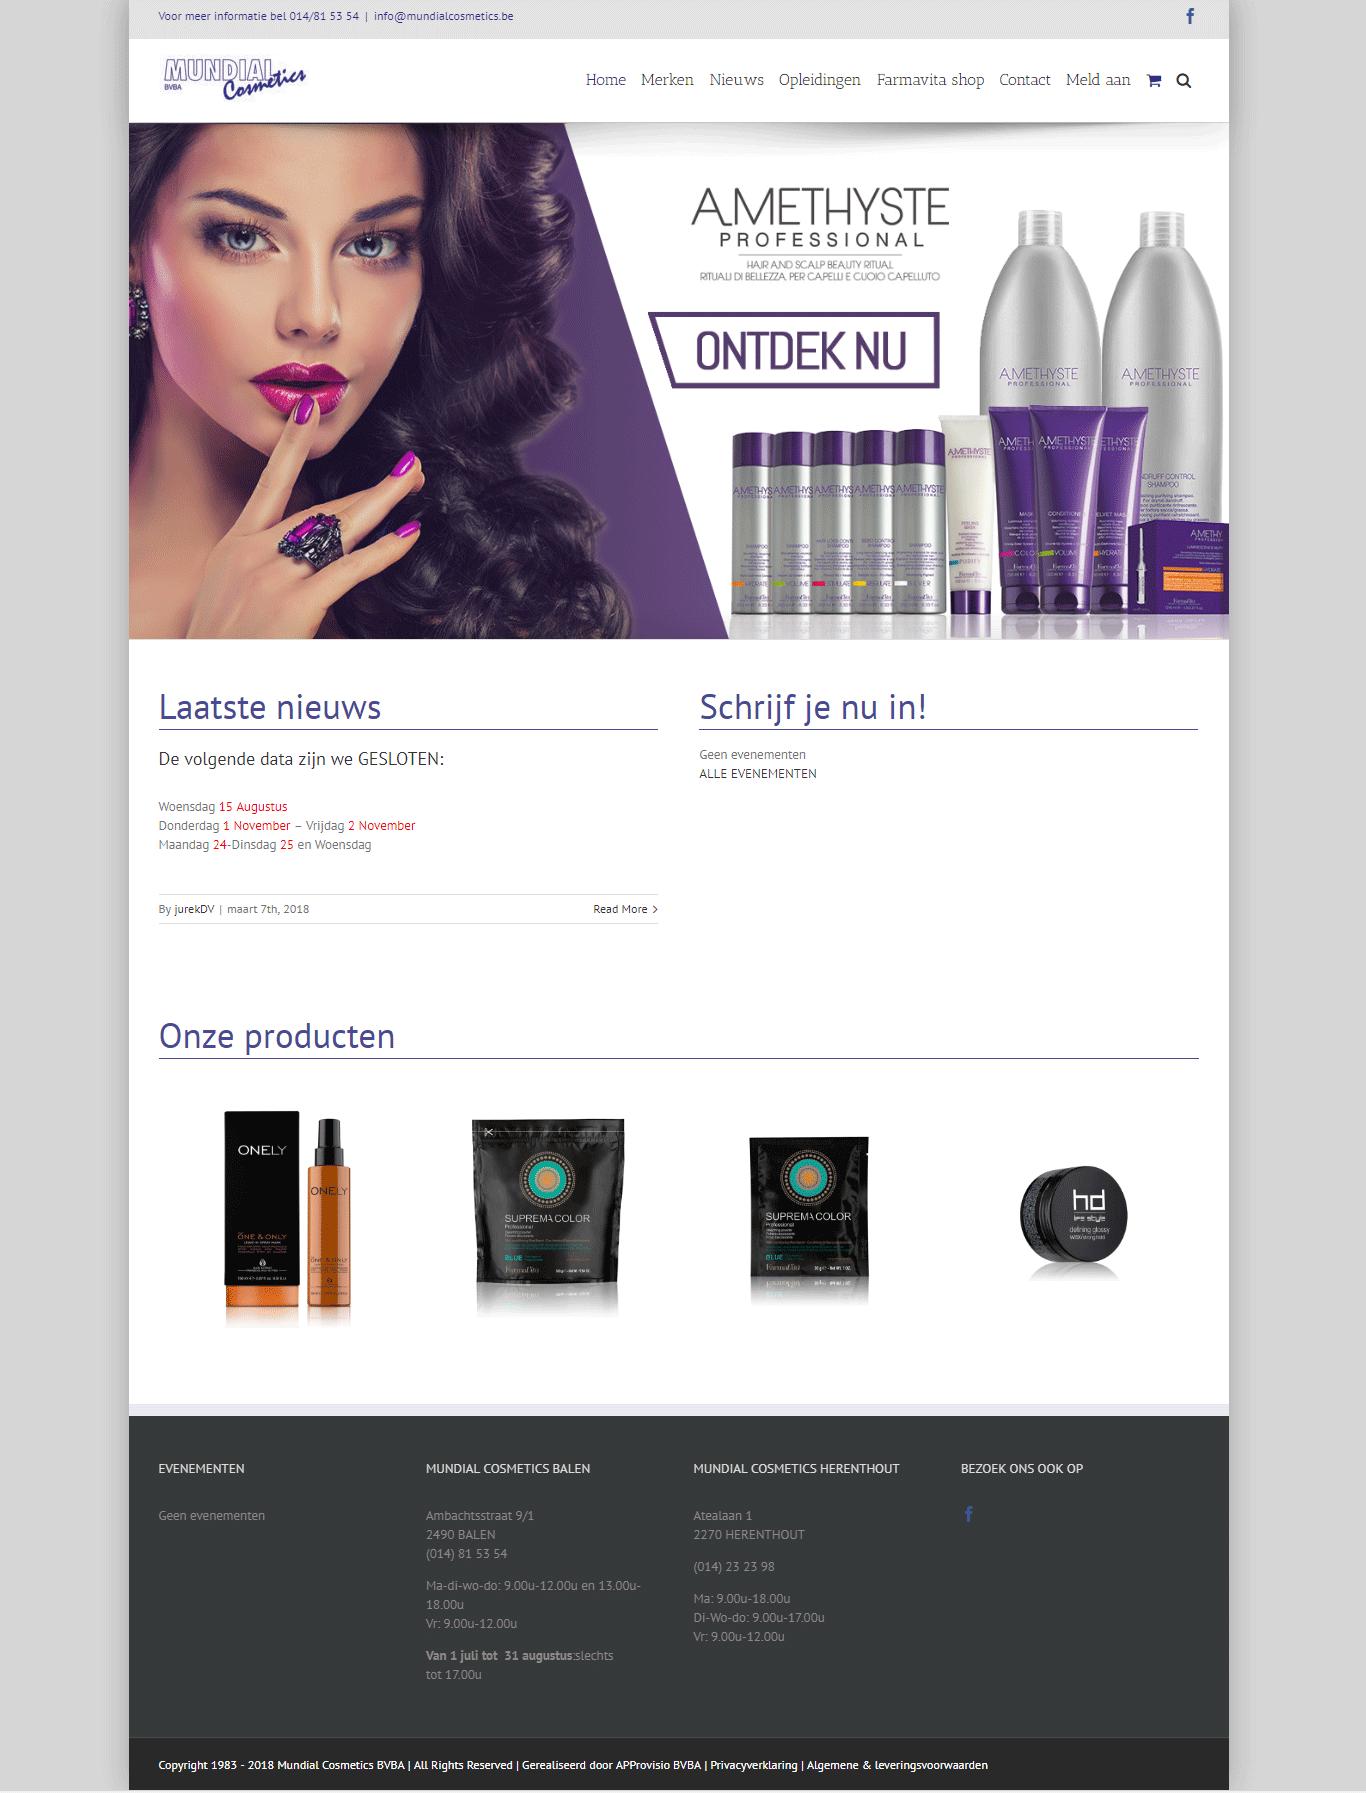 Mundial cosmetics